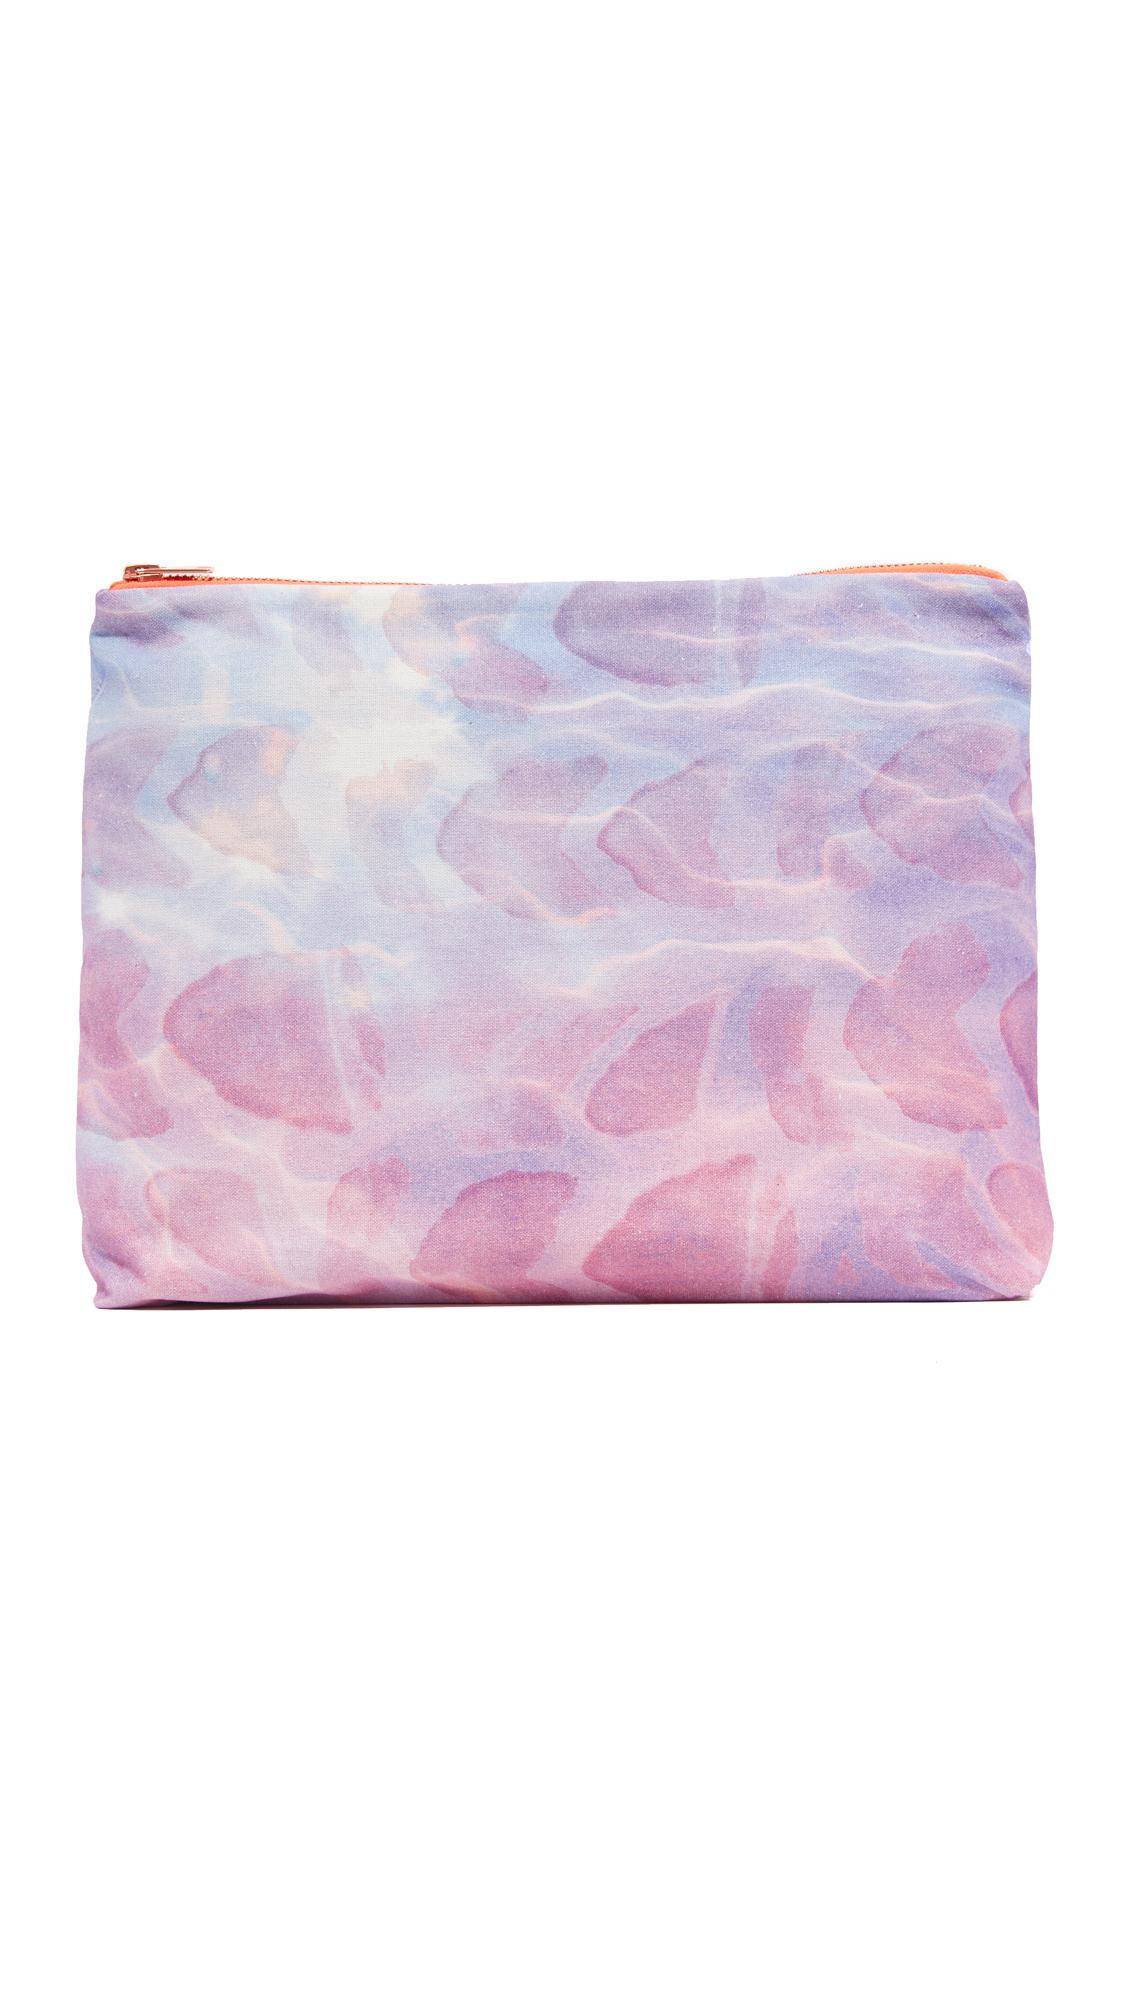 samudra female samudra ocean pouch purple